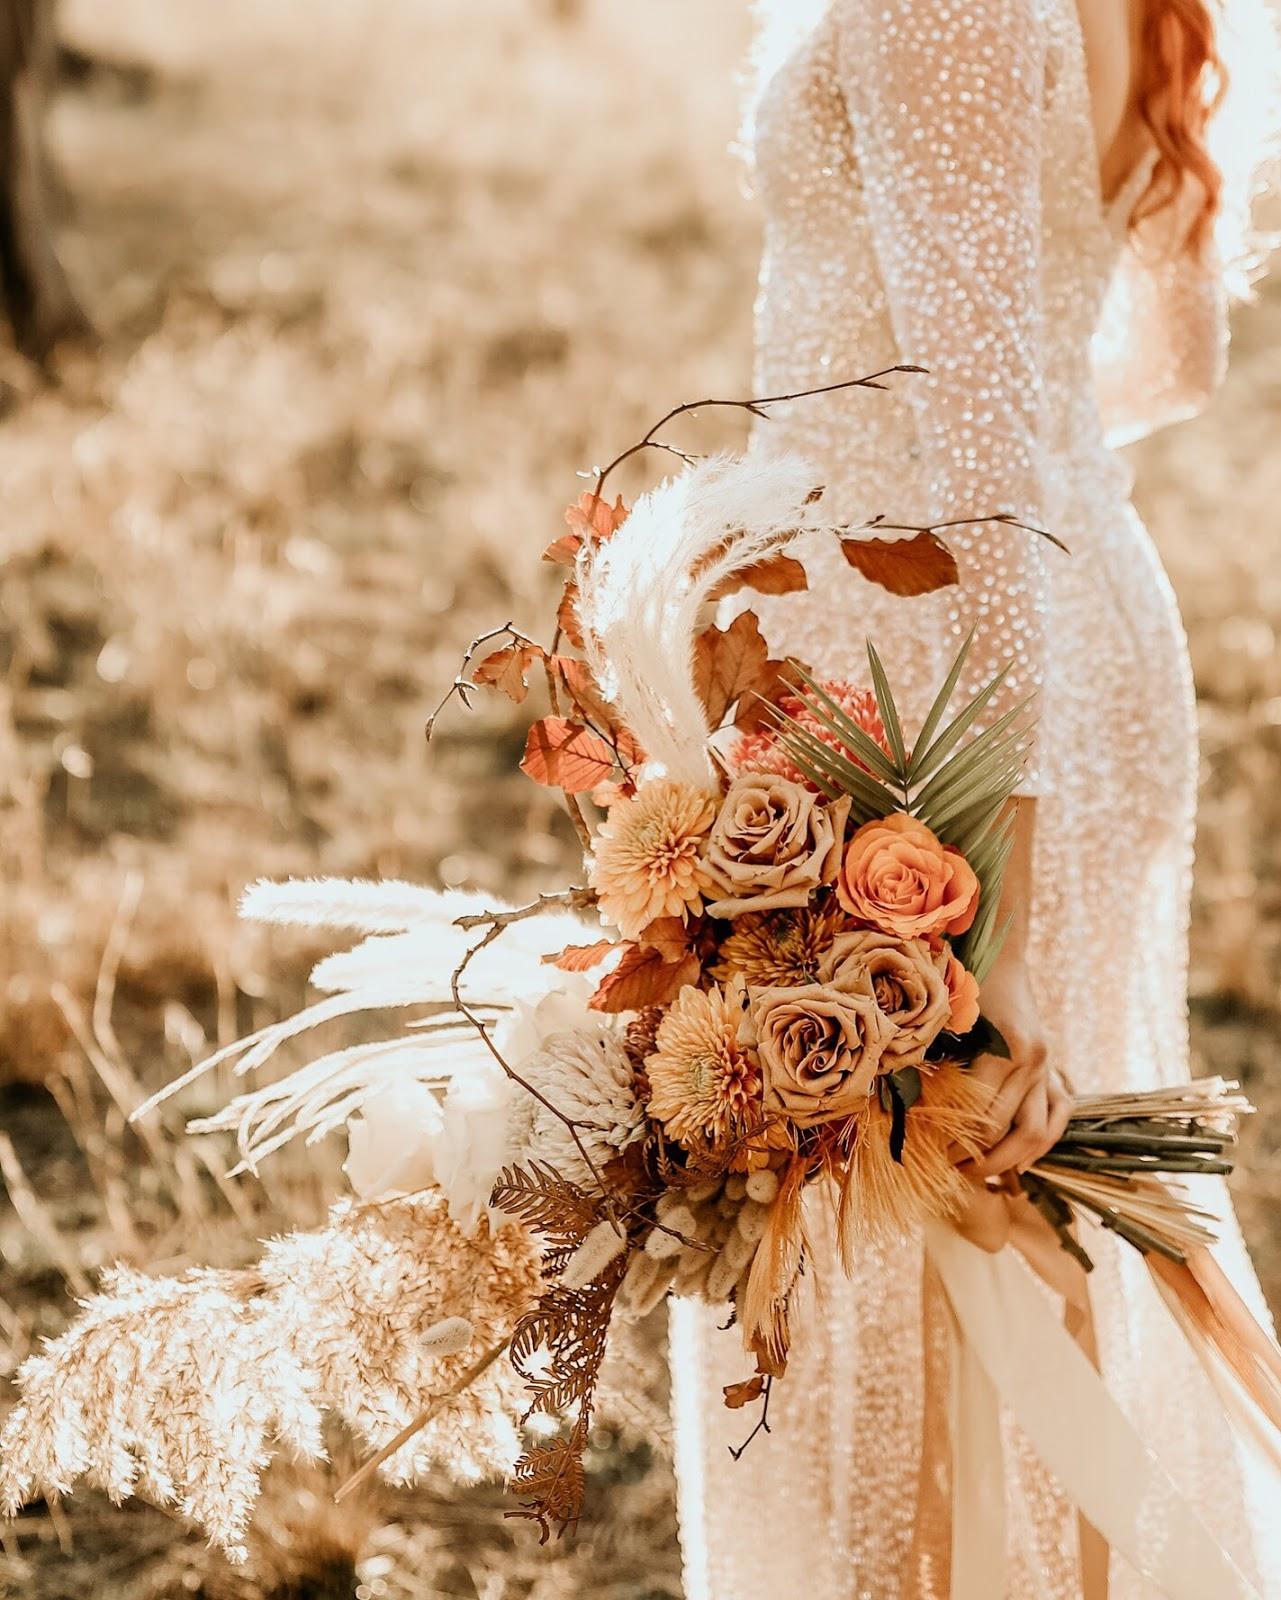 kacie herd photography blue mountains wedding floral designer florals flowers